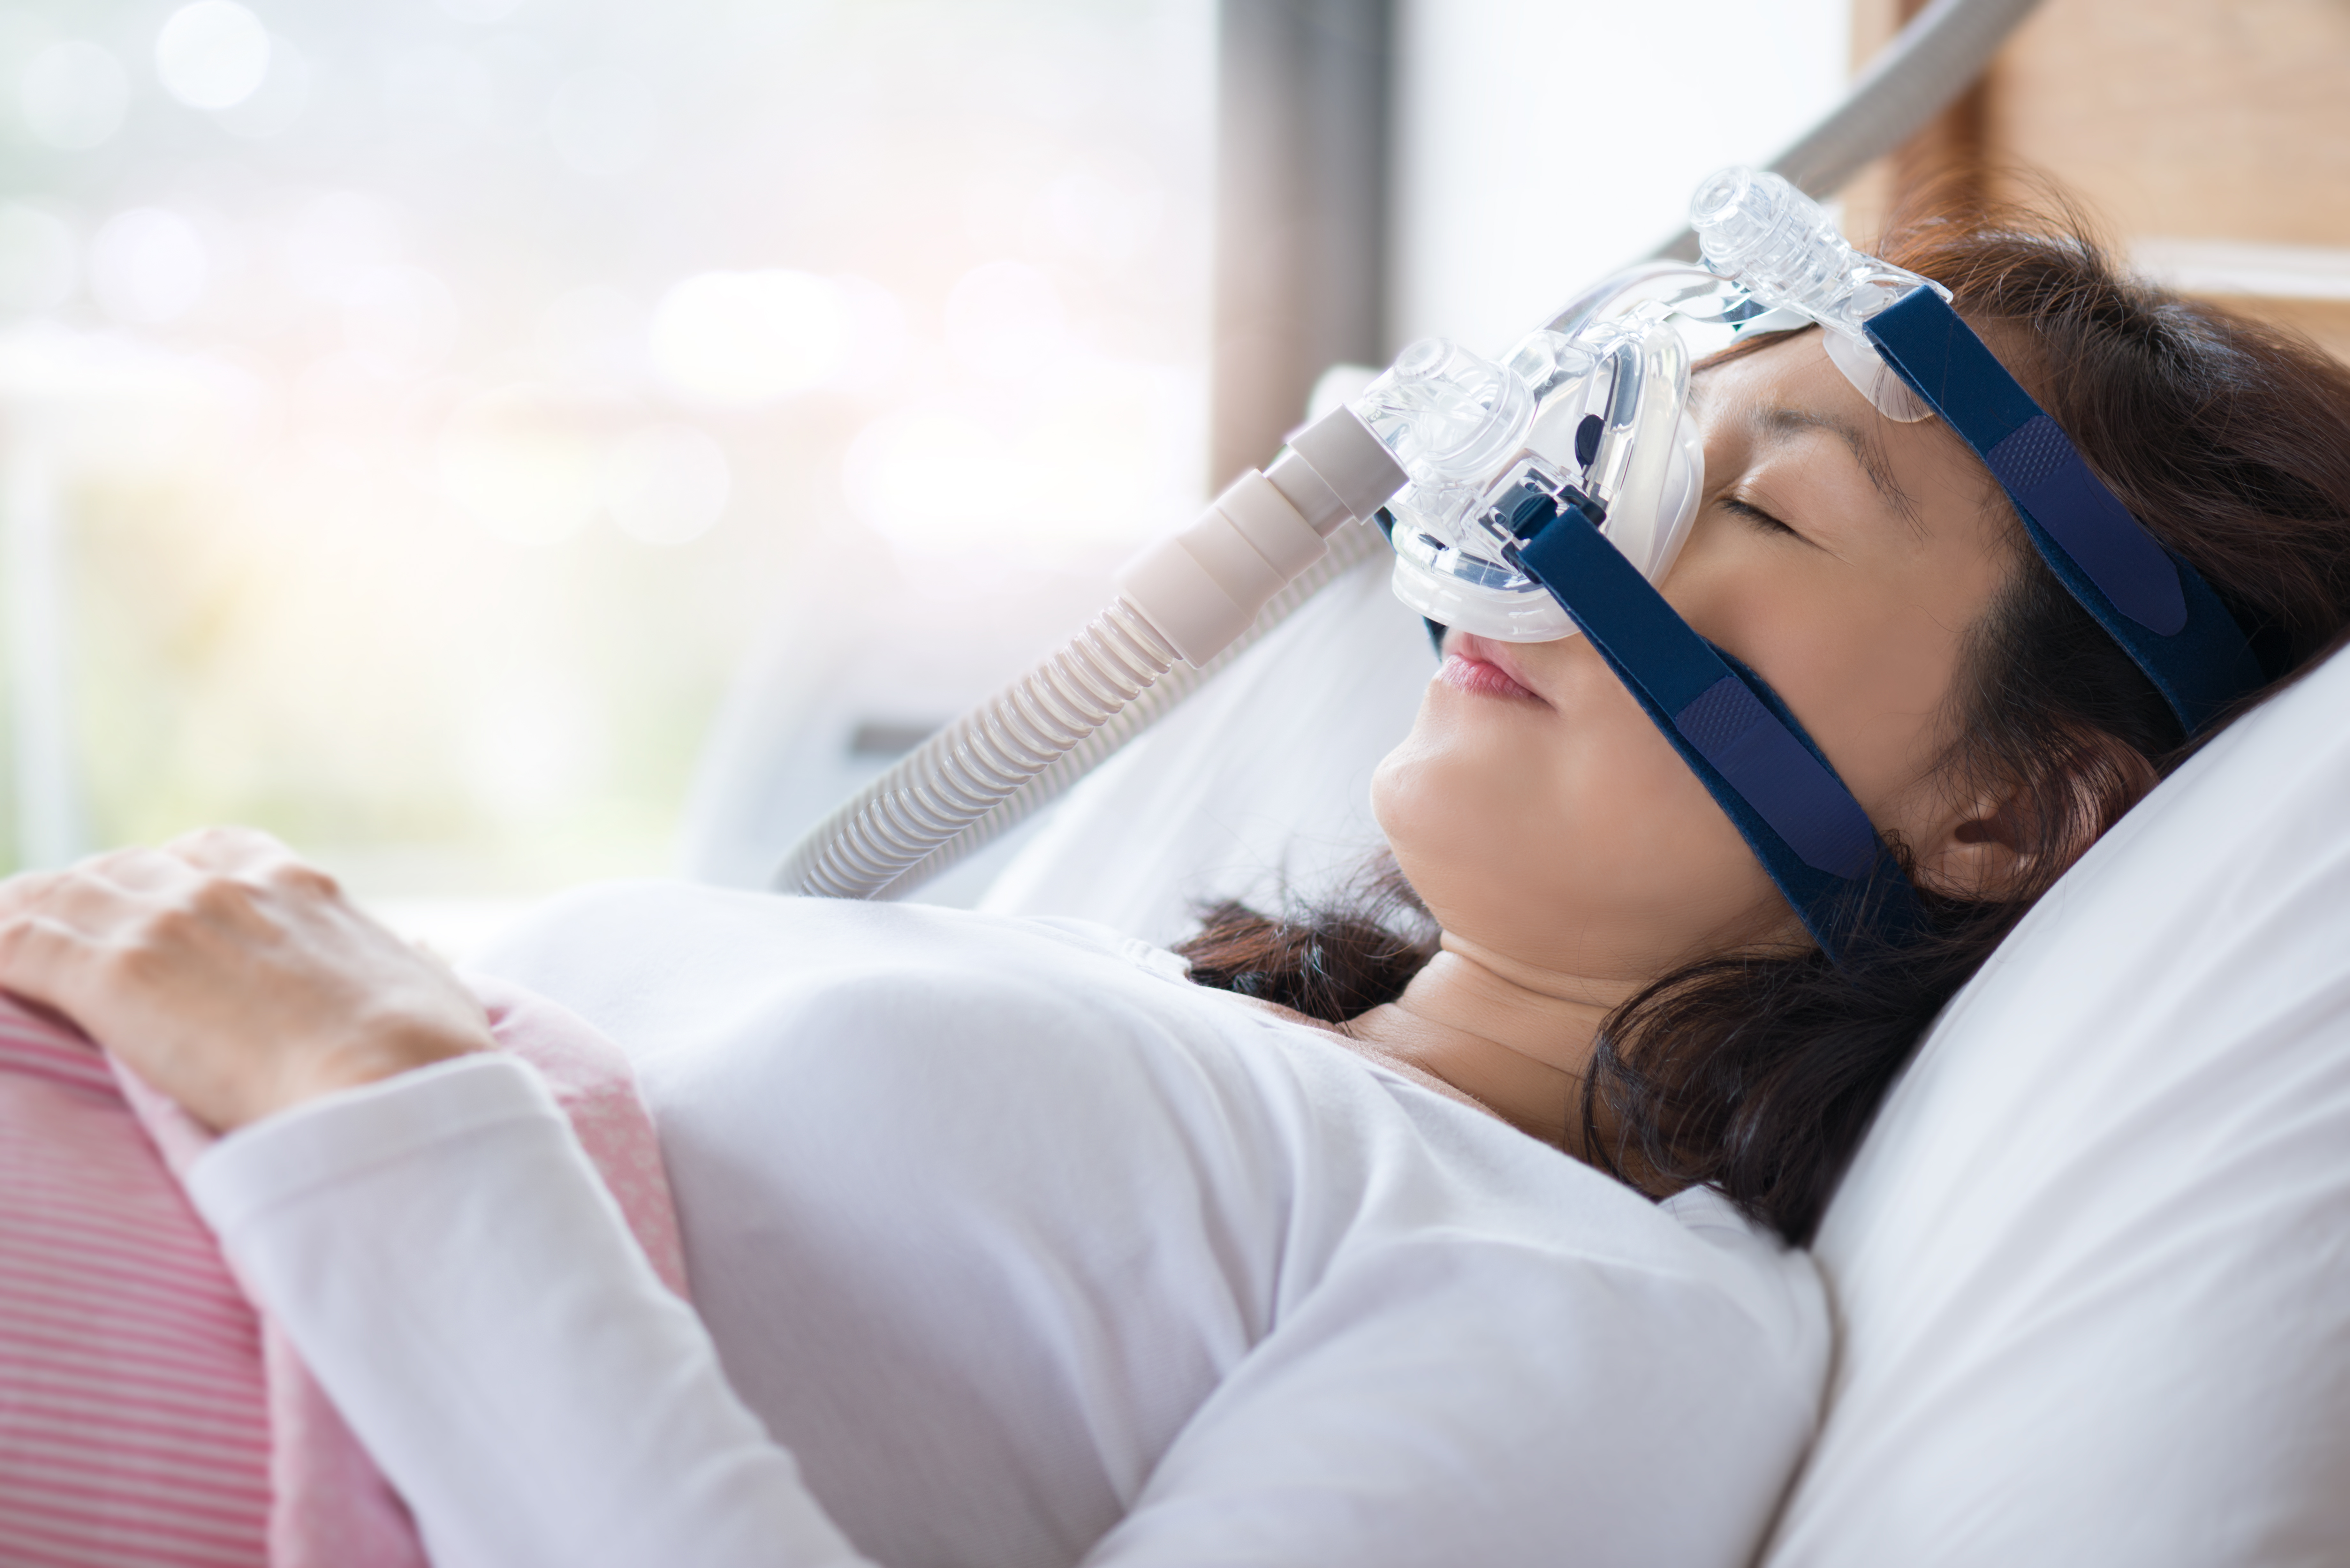 Airway Management for Patients with Sleep Apnea